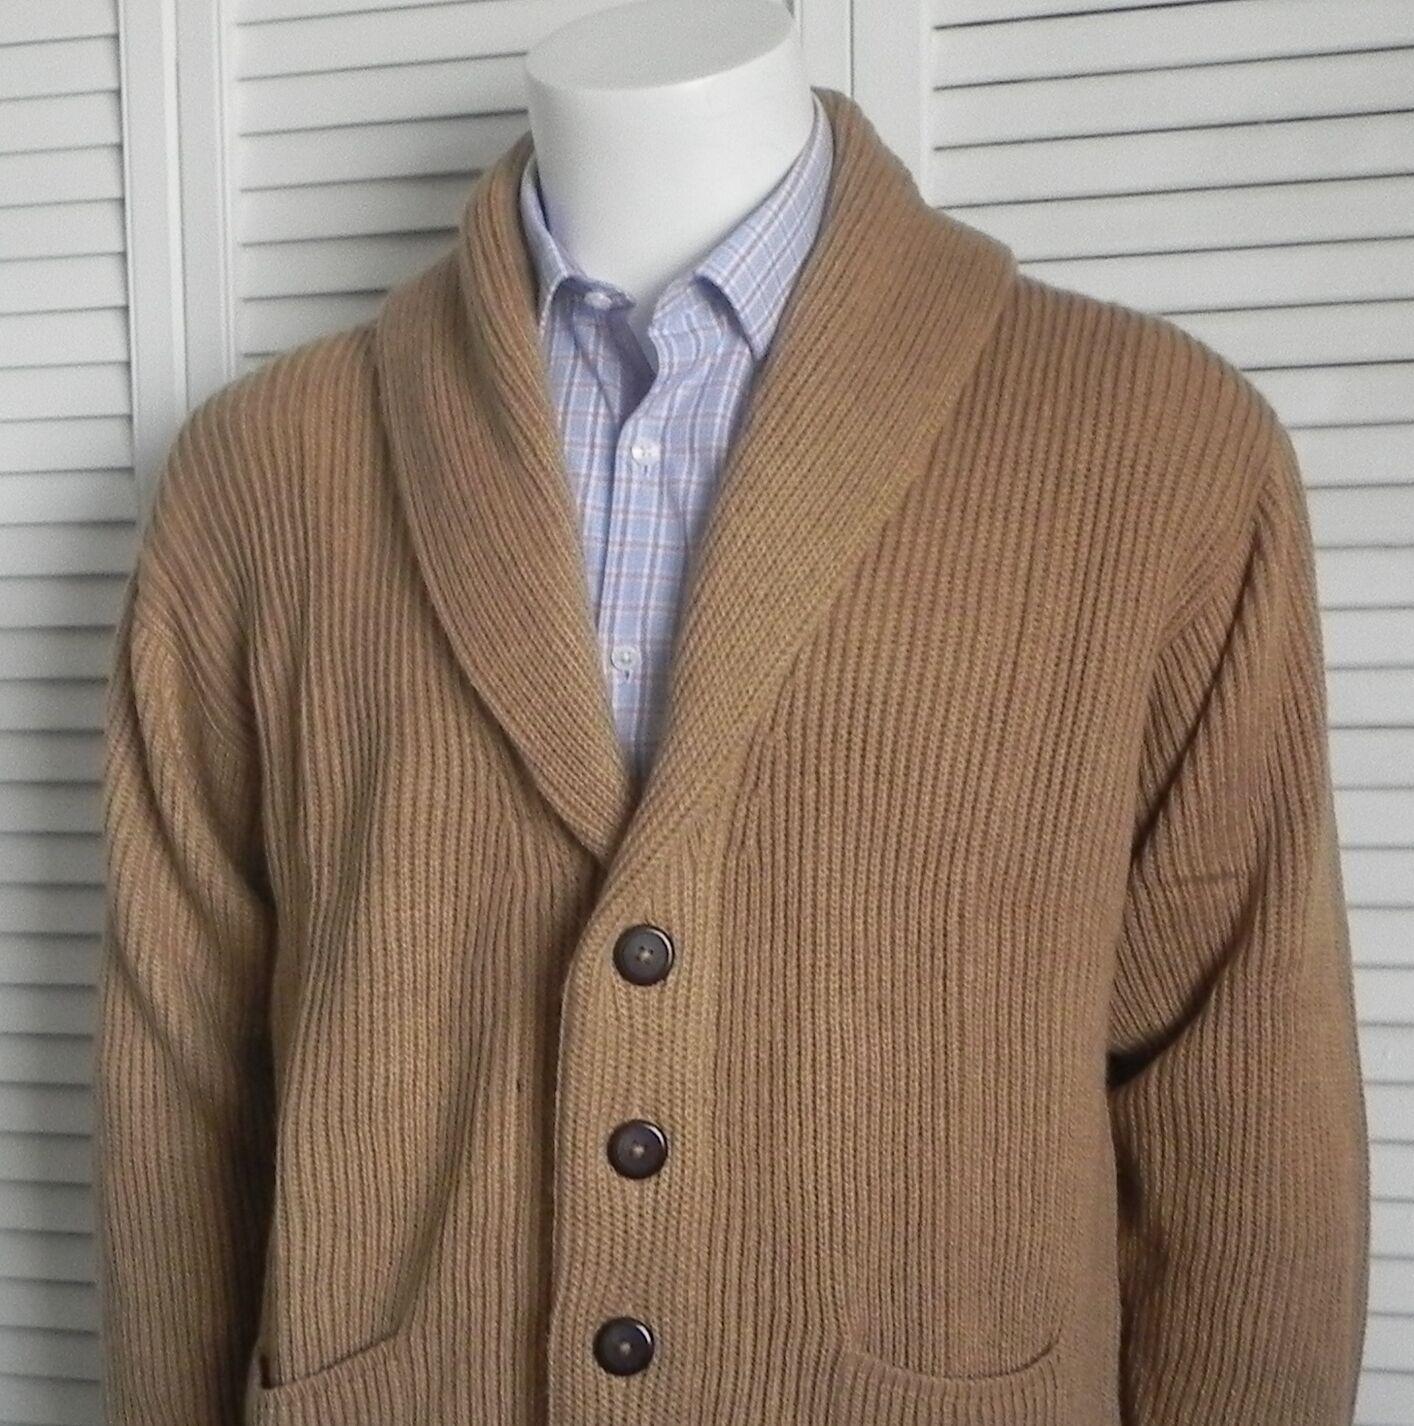 NEW Mens Größe 2XL XXL ALPACA Beige Ribbed Shawl Collar Cardigan Sweater